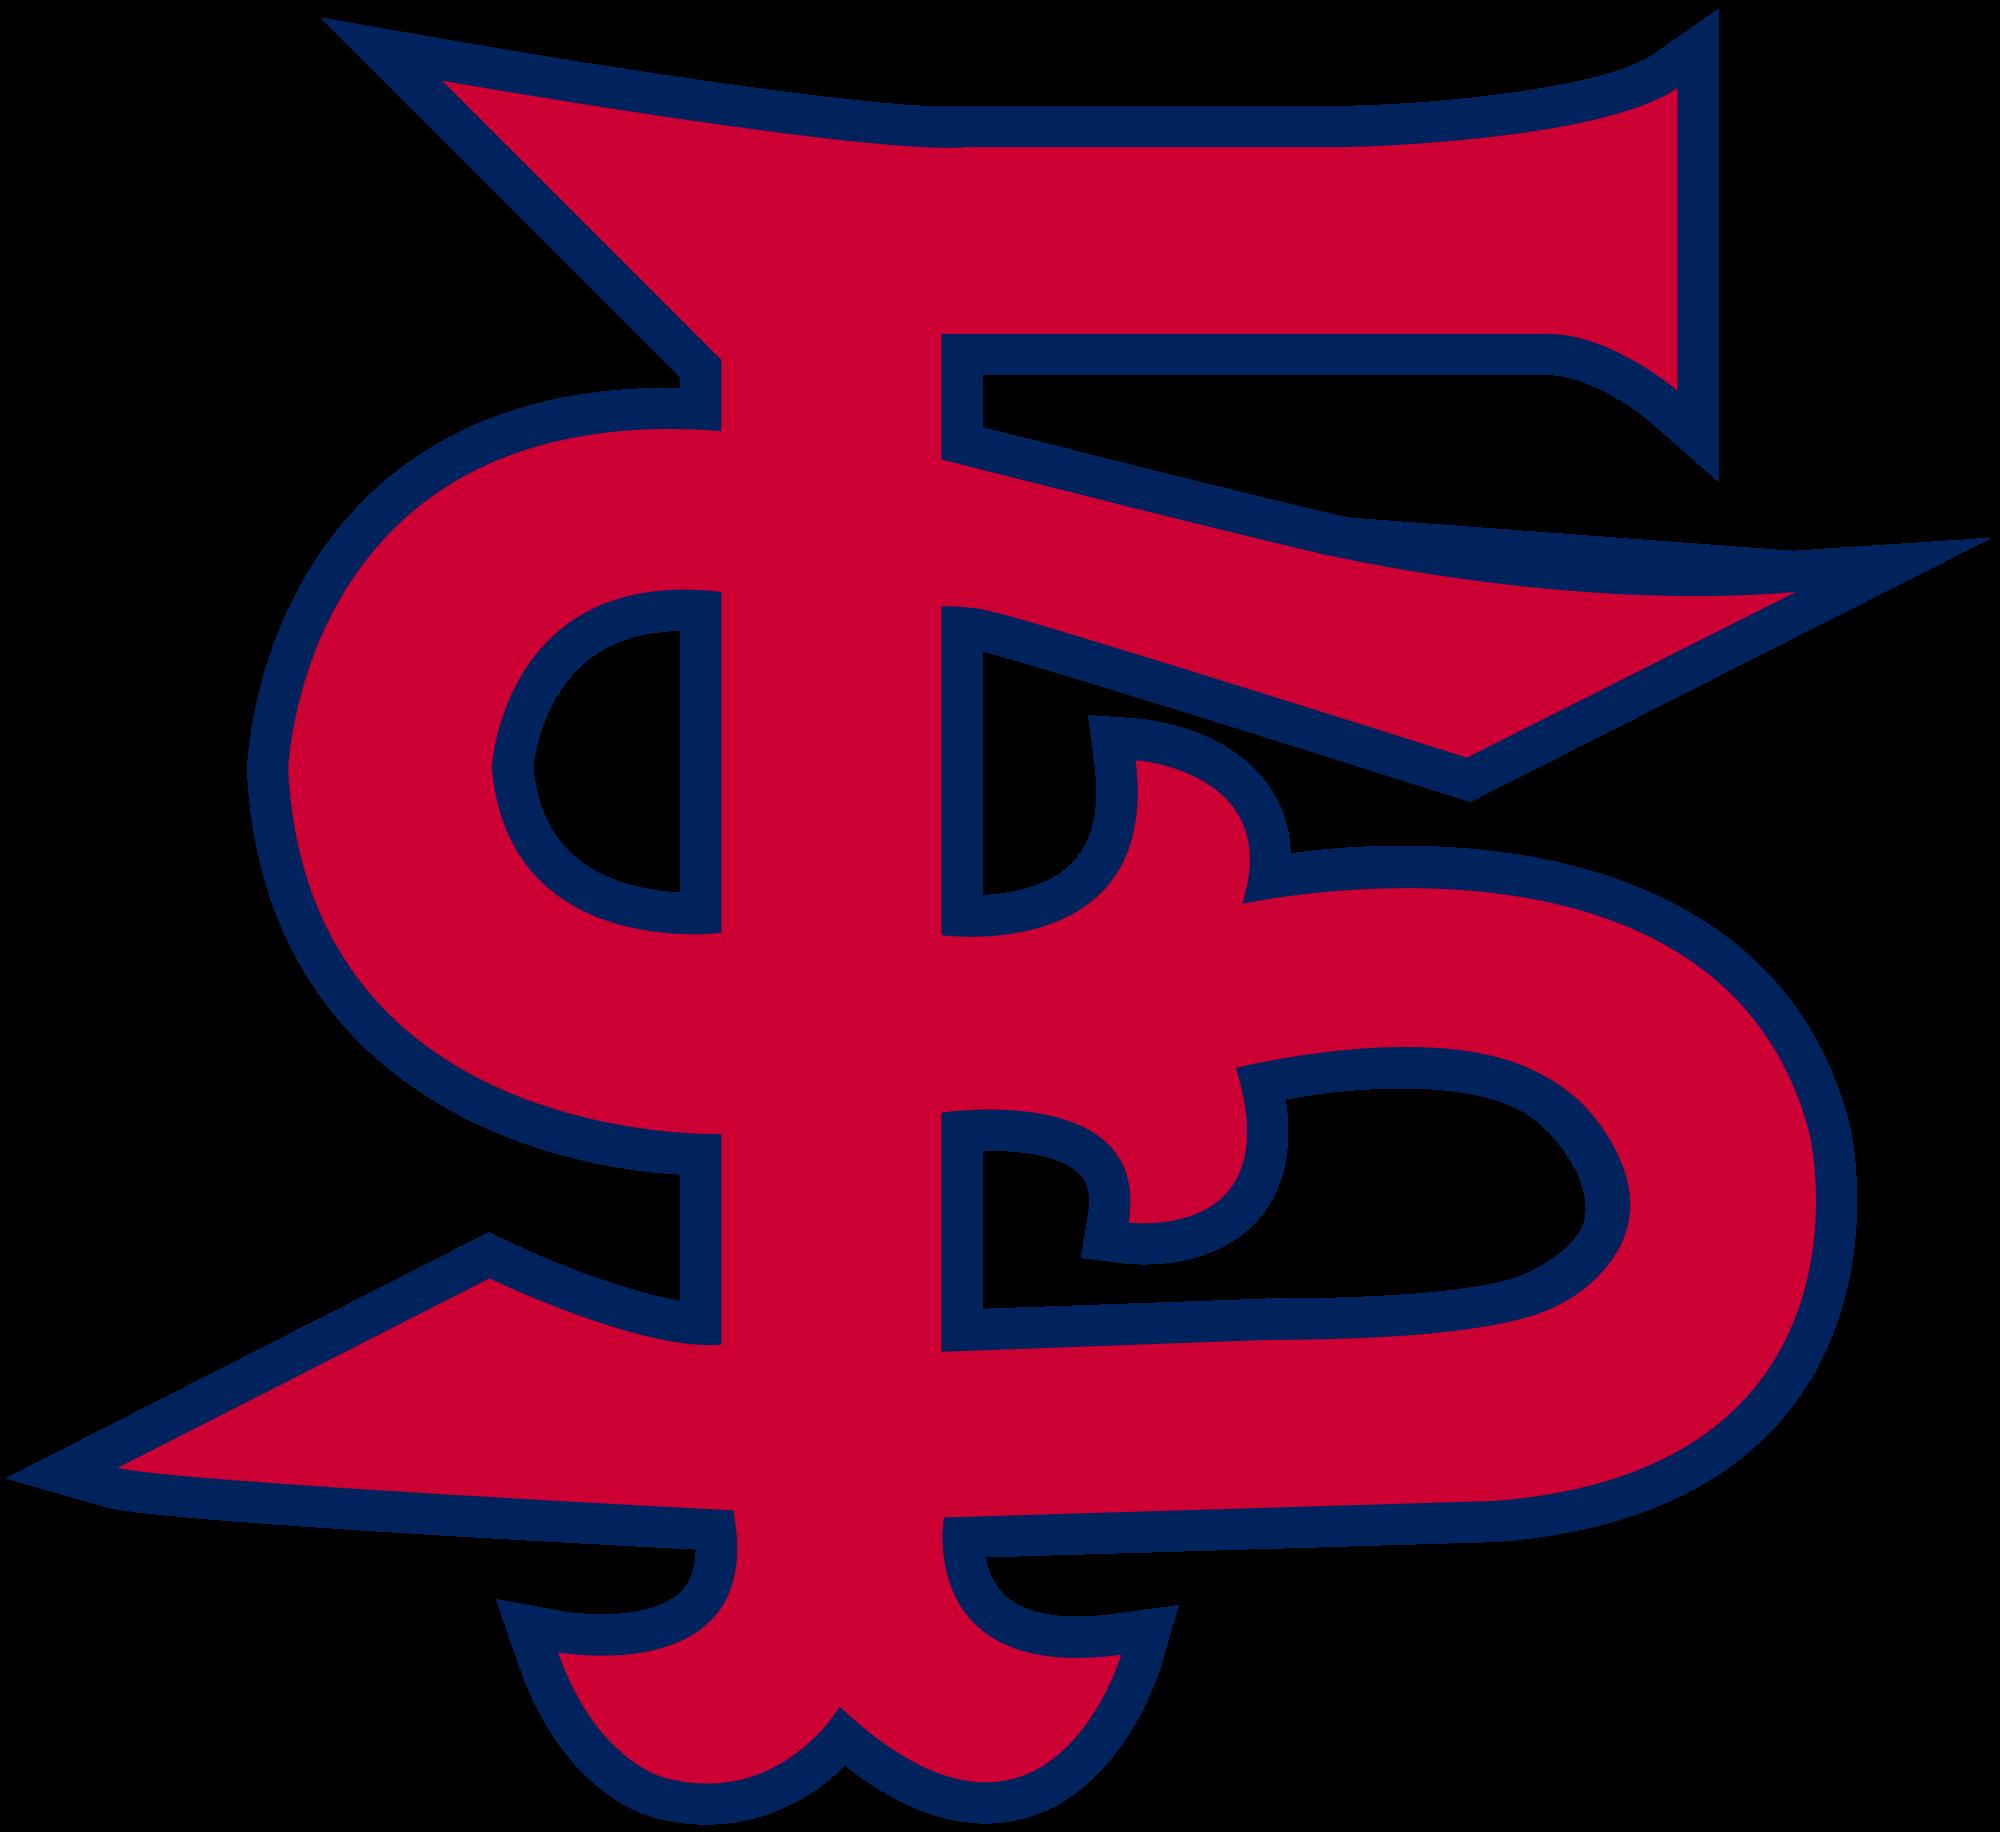 svg free Vector bulldog fresno state. File bulldogs baseball logo